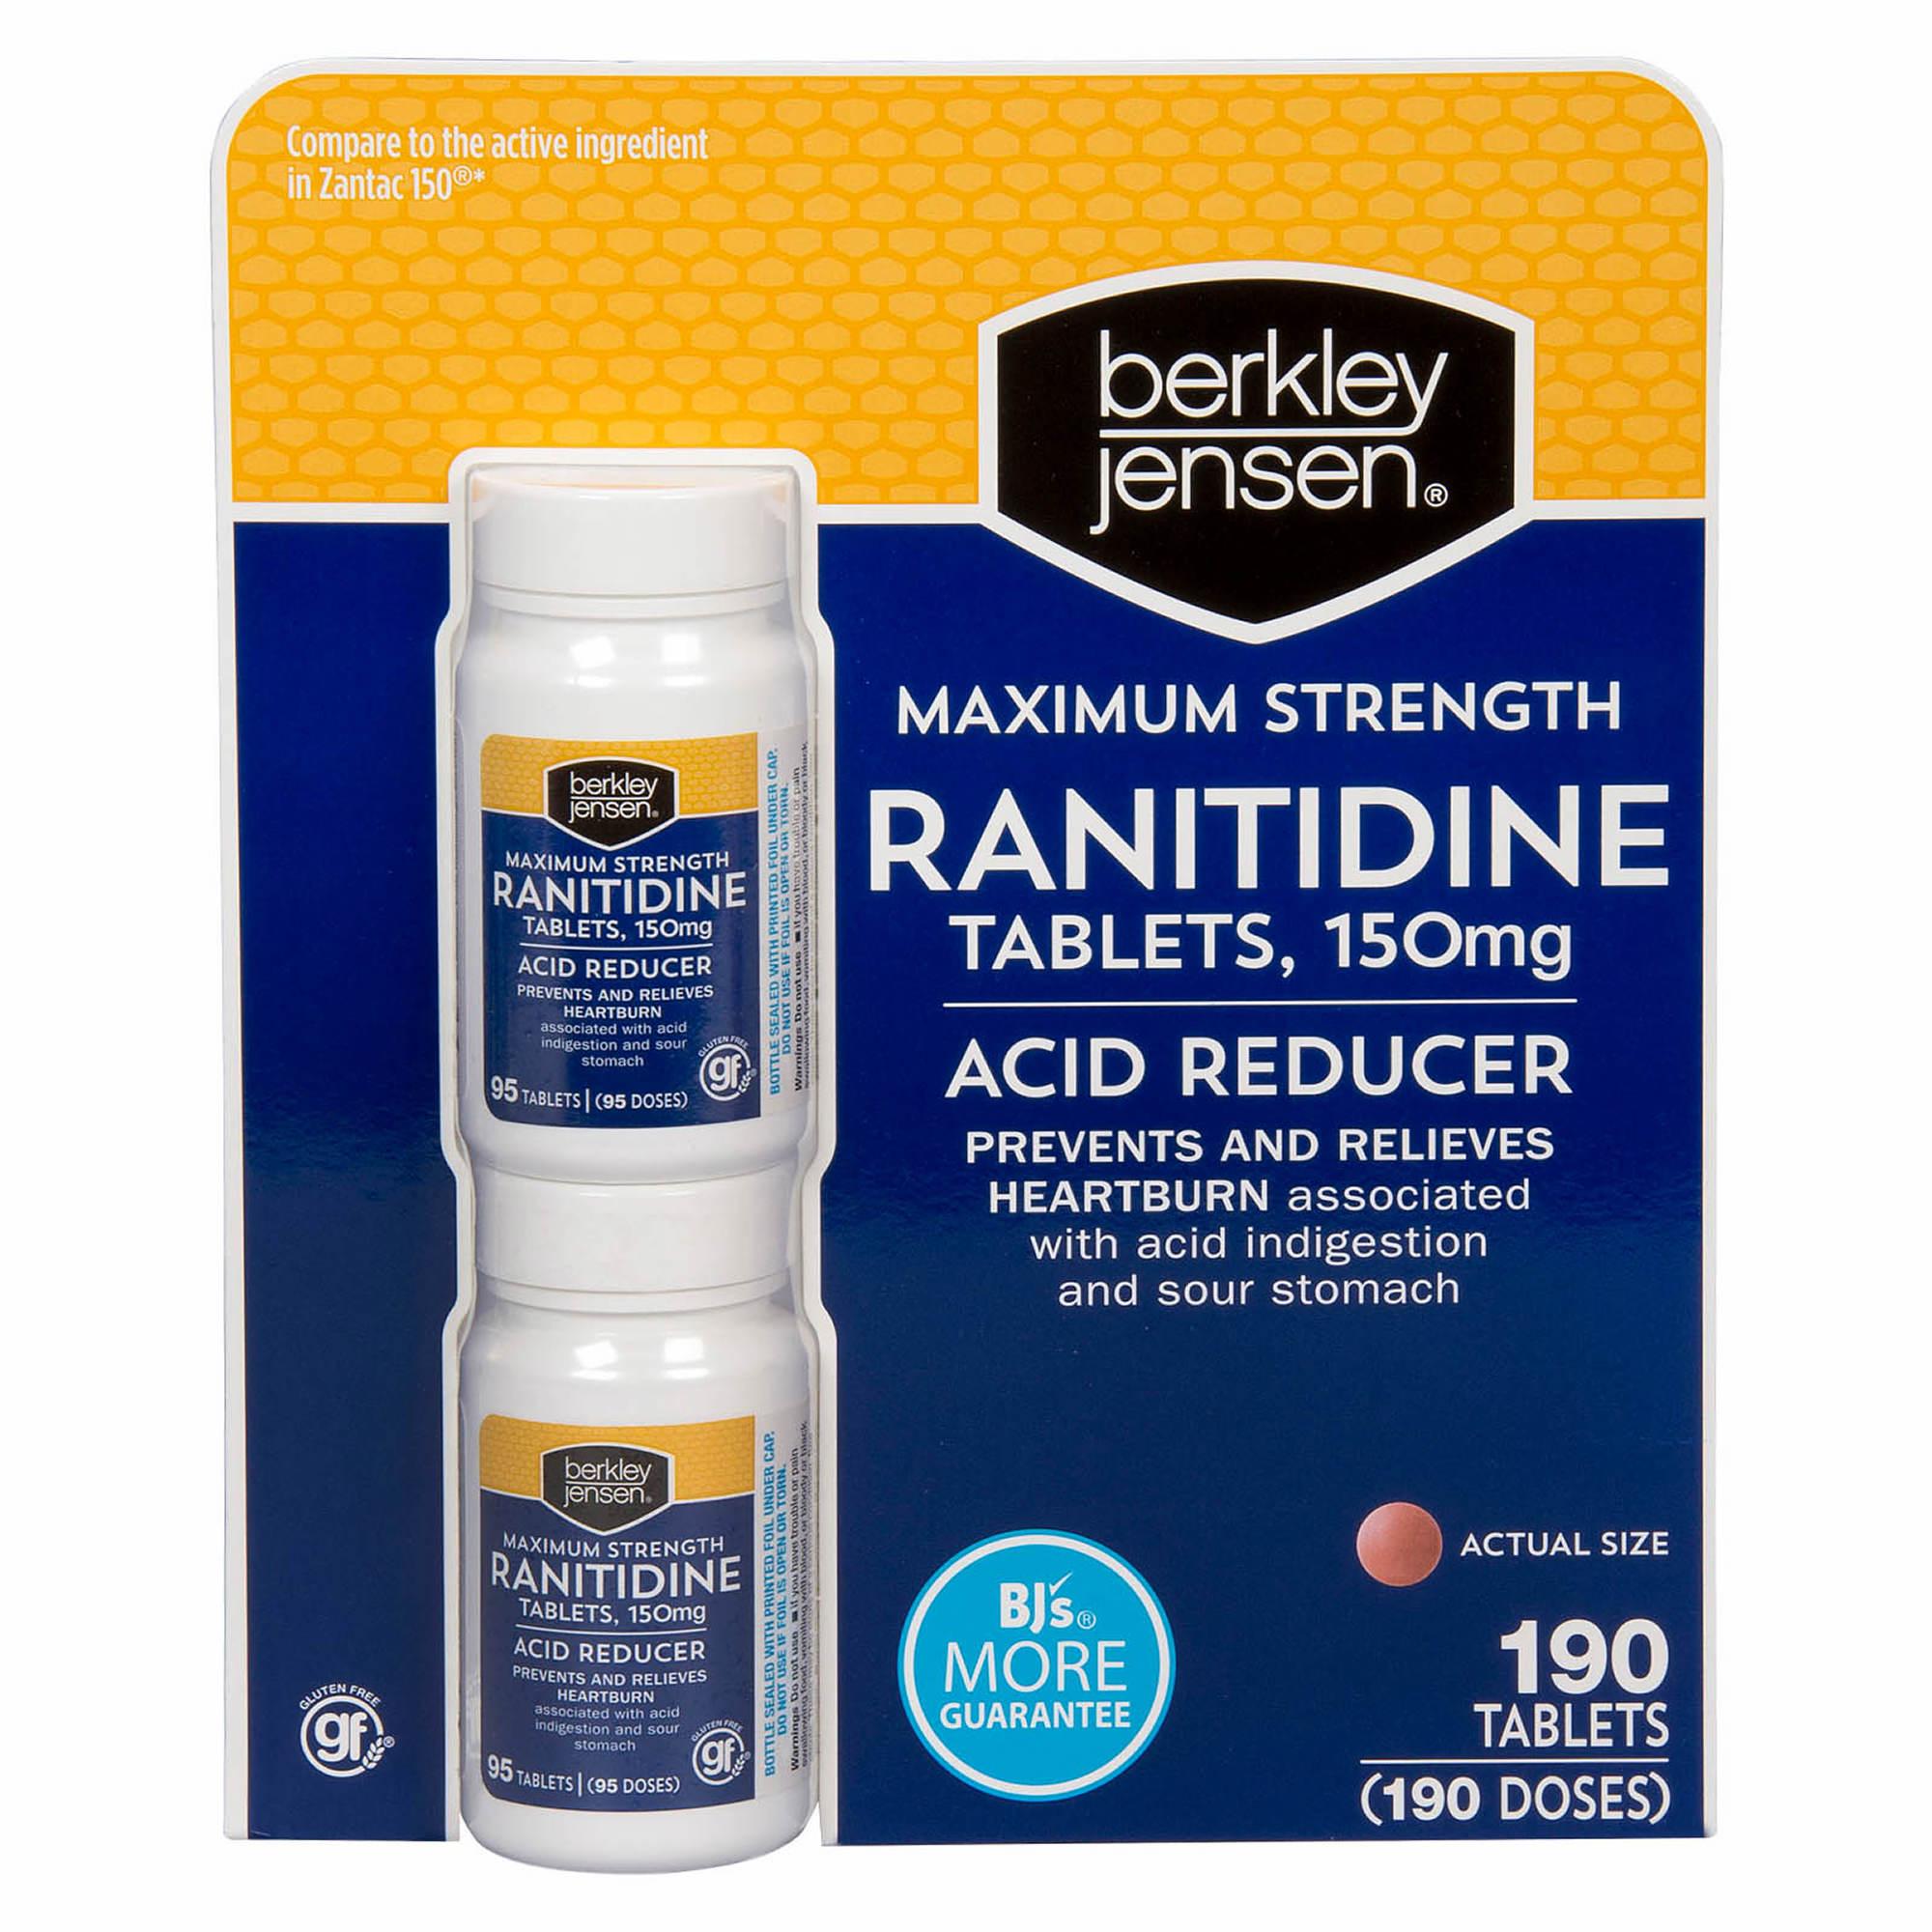 berkley jensen 150mg ranitidine tablets, 2 pk./95 ct. - bjs